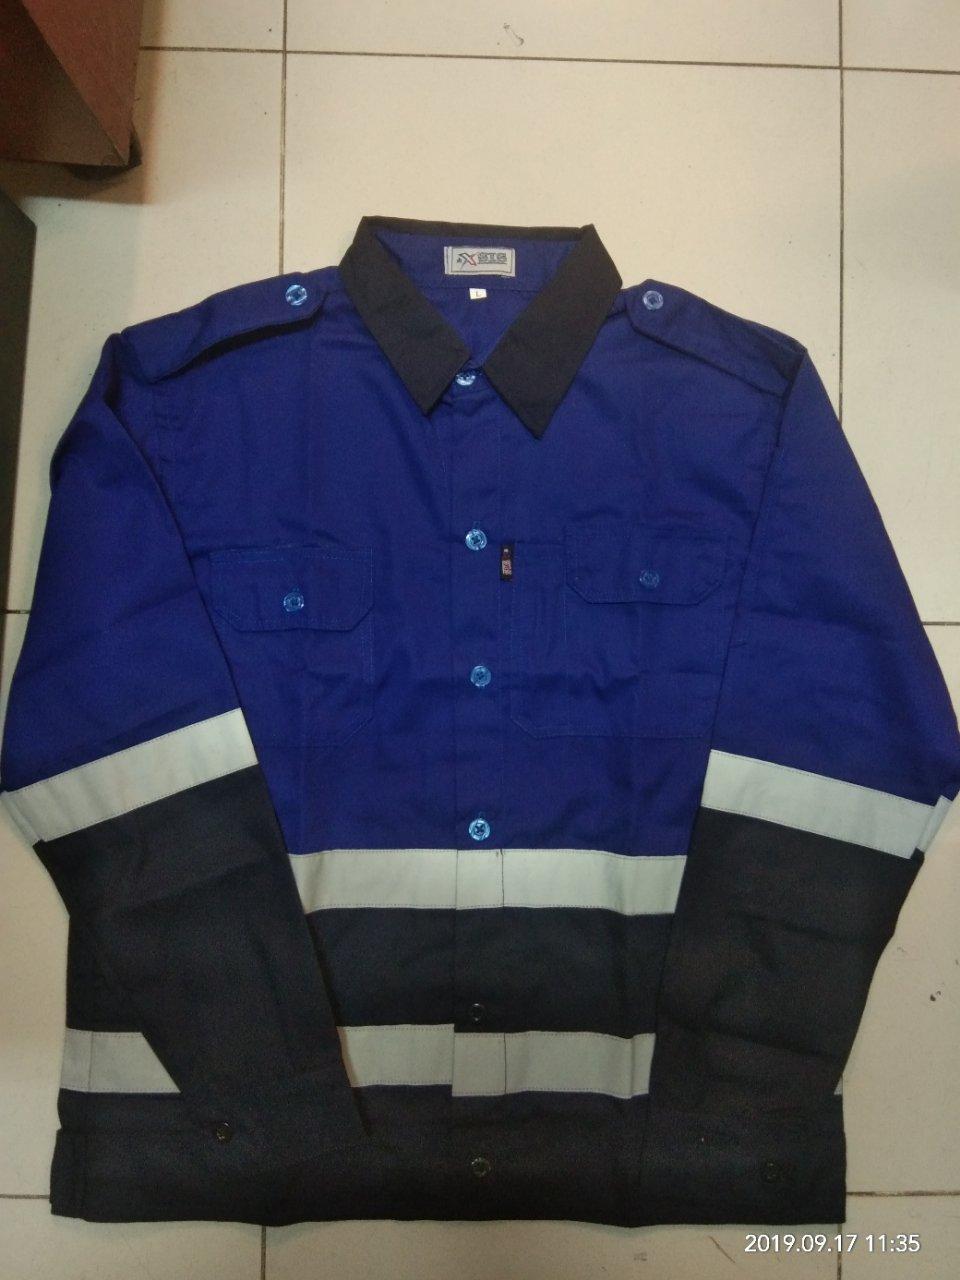 Jual baju safety, distributor baju safety, Jual baju proyek, jual baju proyekJual baju safety, distributor baju safety, Jual baju proyek, jual baju proyekJual baju safety, distributor baju safety, Jual baju proyek, jual baju proyekJual baju safety, distributor baju safety, Jual baju proyek, jual baju proyekJual baju safety, distributor baju safety, Jual baju proyek, jual baju proyekJual baju safety, distributor baju safety, Jual baju proyek, jual baju proyekJual baju safety, distributor baju safety, Jual baju proyek, jual baju proyekJual baju safety, distributor baju safety, Jual baju proyek, jual baju proyekJual baju safety, distributor baju safety, Jual baju proyek, jual baju proyekJual baju safety, distributor baju safety, Jual baju proyek, jual baju proyekJual baju safety, distributor baju safety, Jual baju proyek, jual baju proyekJual baju safety, distributor baju safety, Jual baju proyek, jual baju proyekJual baju safety, distributor baju safety, Jual baju proyek, jual baju proyekJual baju safety, distributor baju safety, Jual baju proyek, jual baju proyekJual baju safety, distributor baju safety, Jual baju proyek, jual baju proyekJual baju safety, distributor baju safety, Jual baju proyek, jual baju proyekJual baju safety, distributor baju safety, Jual baju proyek, jual baju proyekJual baju safety, distributor baju safety, Jual baju proyek, jual baju proyekJual baju safety, distributor baju safety, Jual baju proyek, jual baju proyekJual baju safety, distributor baju safety, Jual baju proyek, jual baju proyekJual baju safety, distributor baju safety, Jual baju proyek, jual baju proyekJual baju safety, distributor baju safety, Jual baju proyek, jual baju proyekJual baju safety, distributor baju safety, Jual baju proyek, jual baju proyekJual baju safety, distributor baju safety, Jual baju proyek, jual baju proyekJual baju safety, distributor baju safety, Jual baju proyek, jual baju proyekJual baju safety, distributor baju safety, Jual baju proyek, jual baju proy